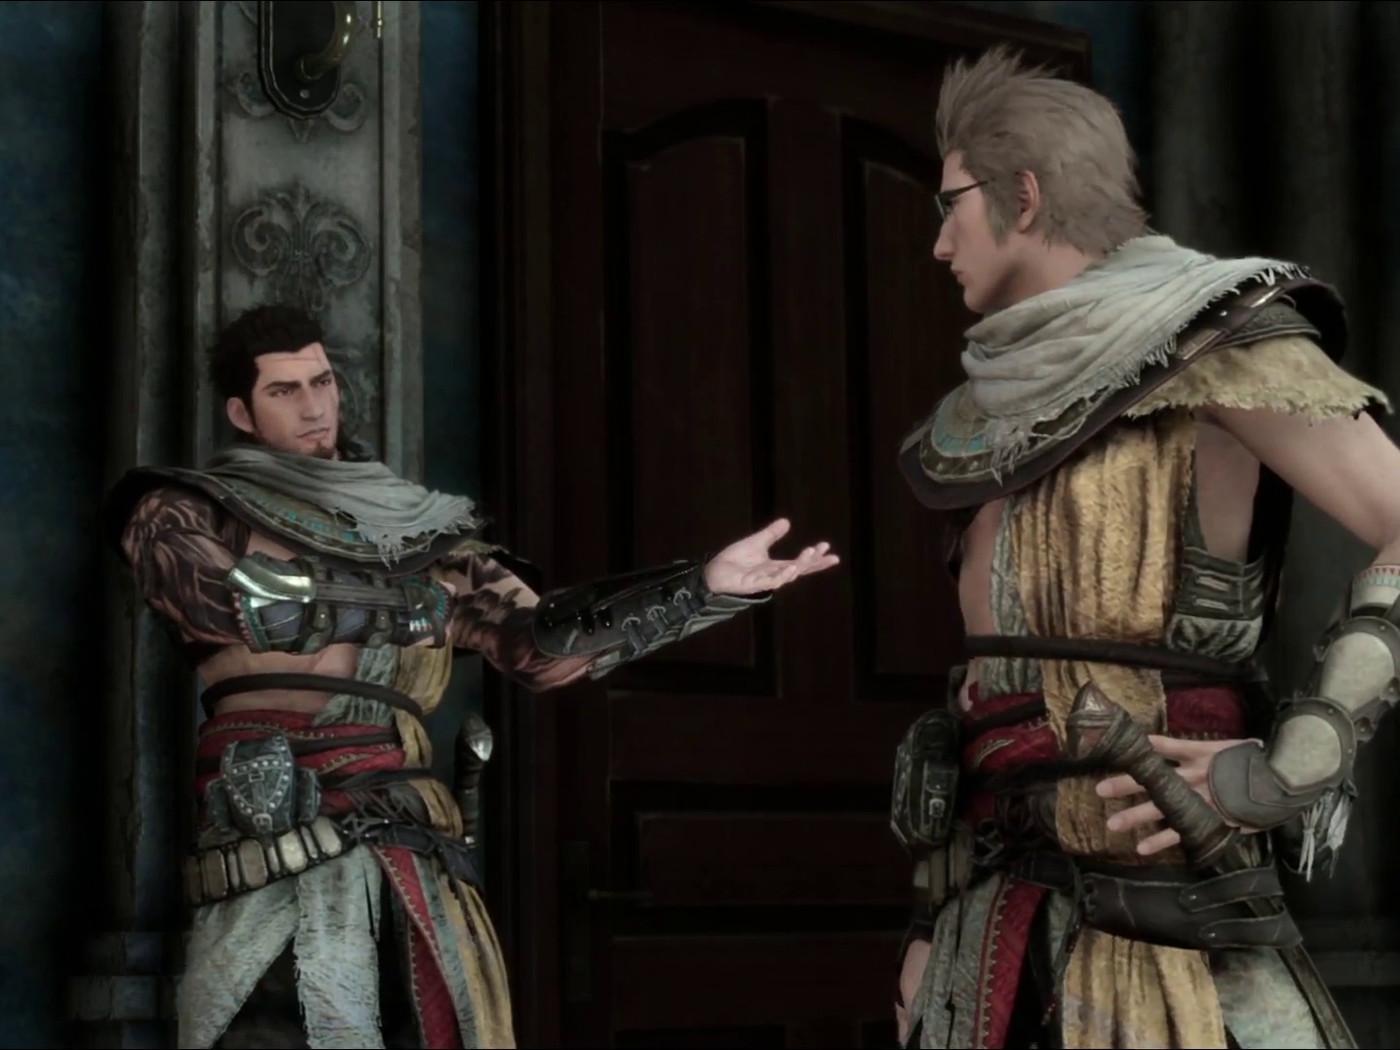 Assassin S Creed Dlc For Final Fantasy 15 Looks Pretty Rad